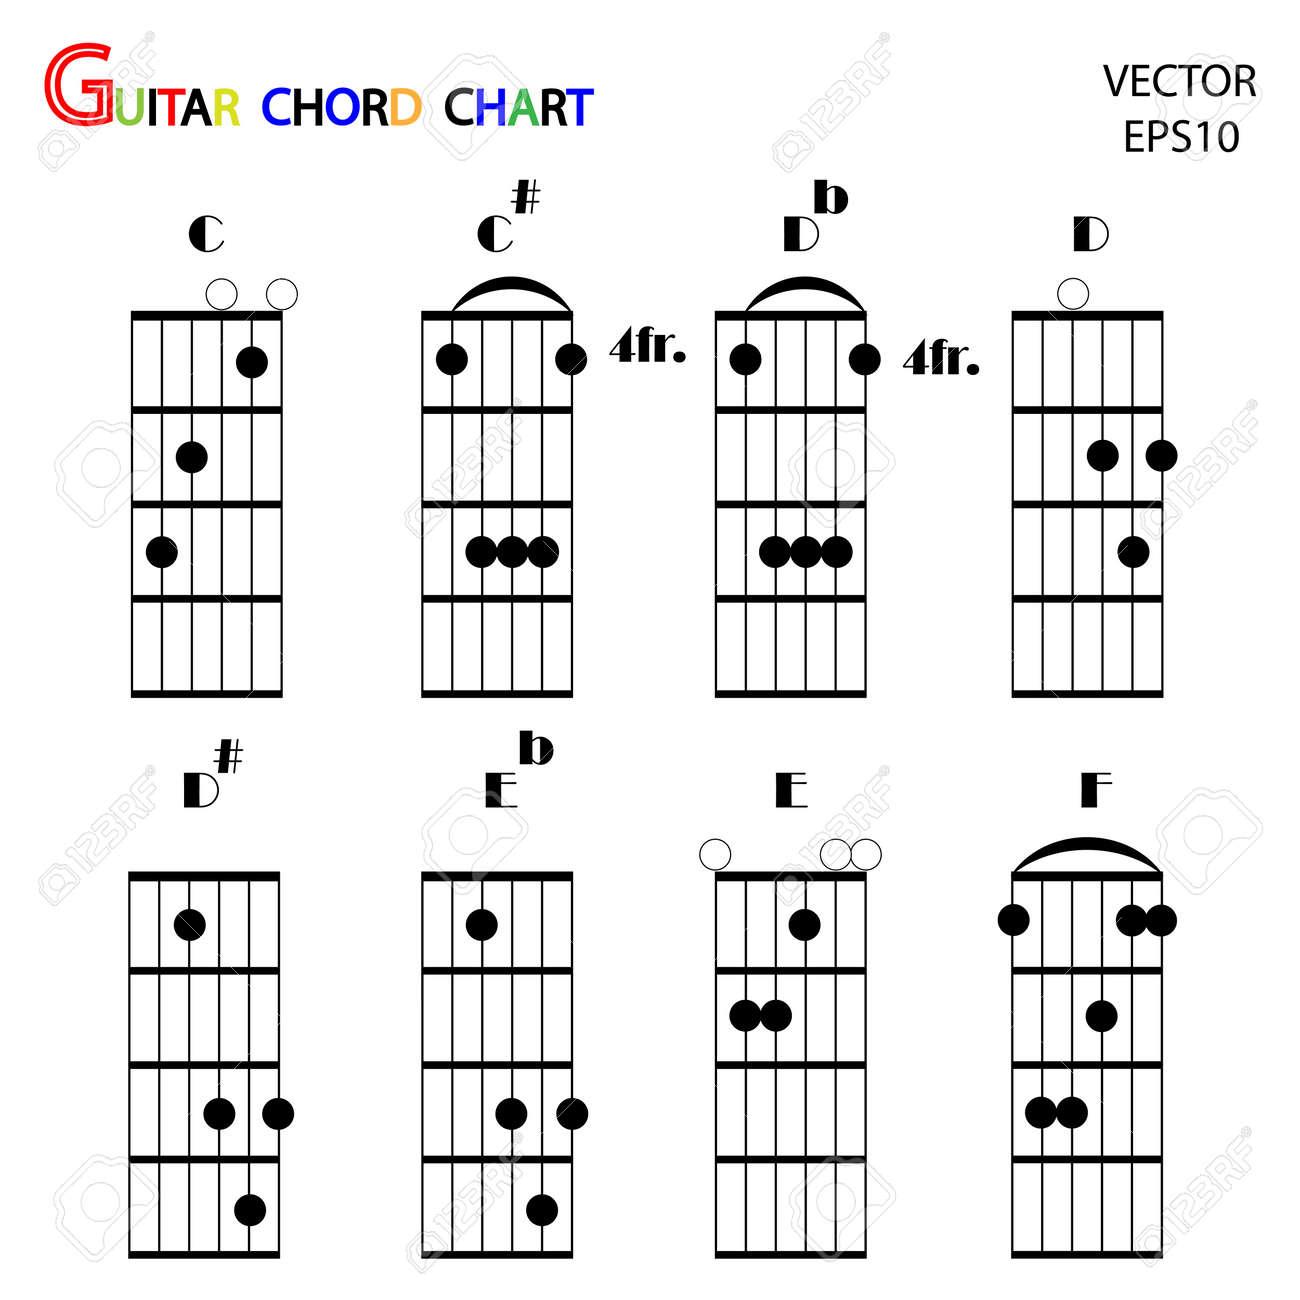 Basic guitar chords tab guitar chordsvector royalty free basic guitar chords tab guitar chordsvector stock vector 18165377 hexwebz Choice Image